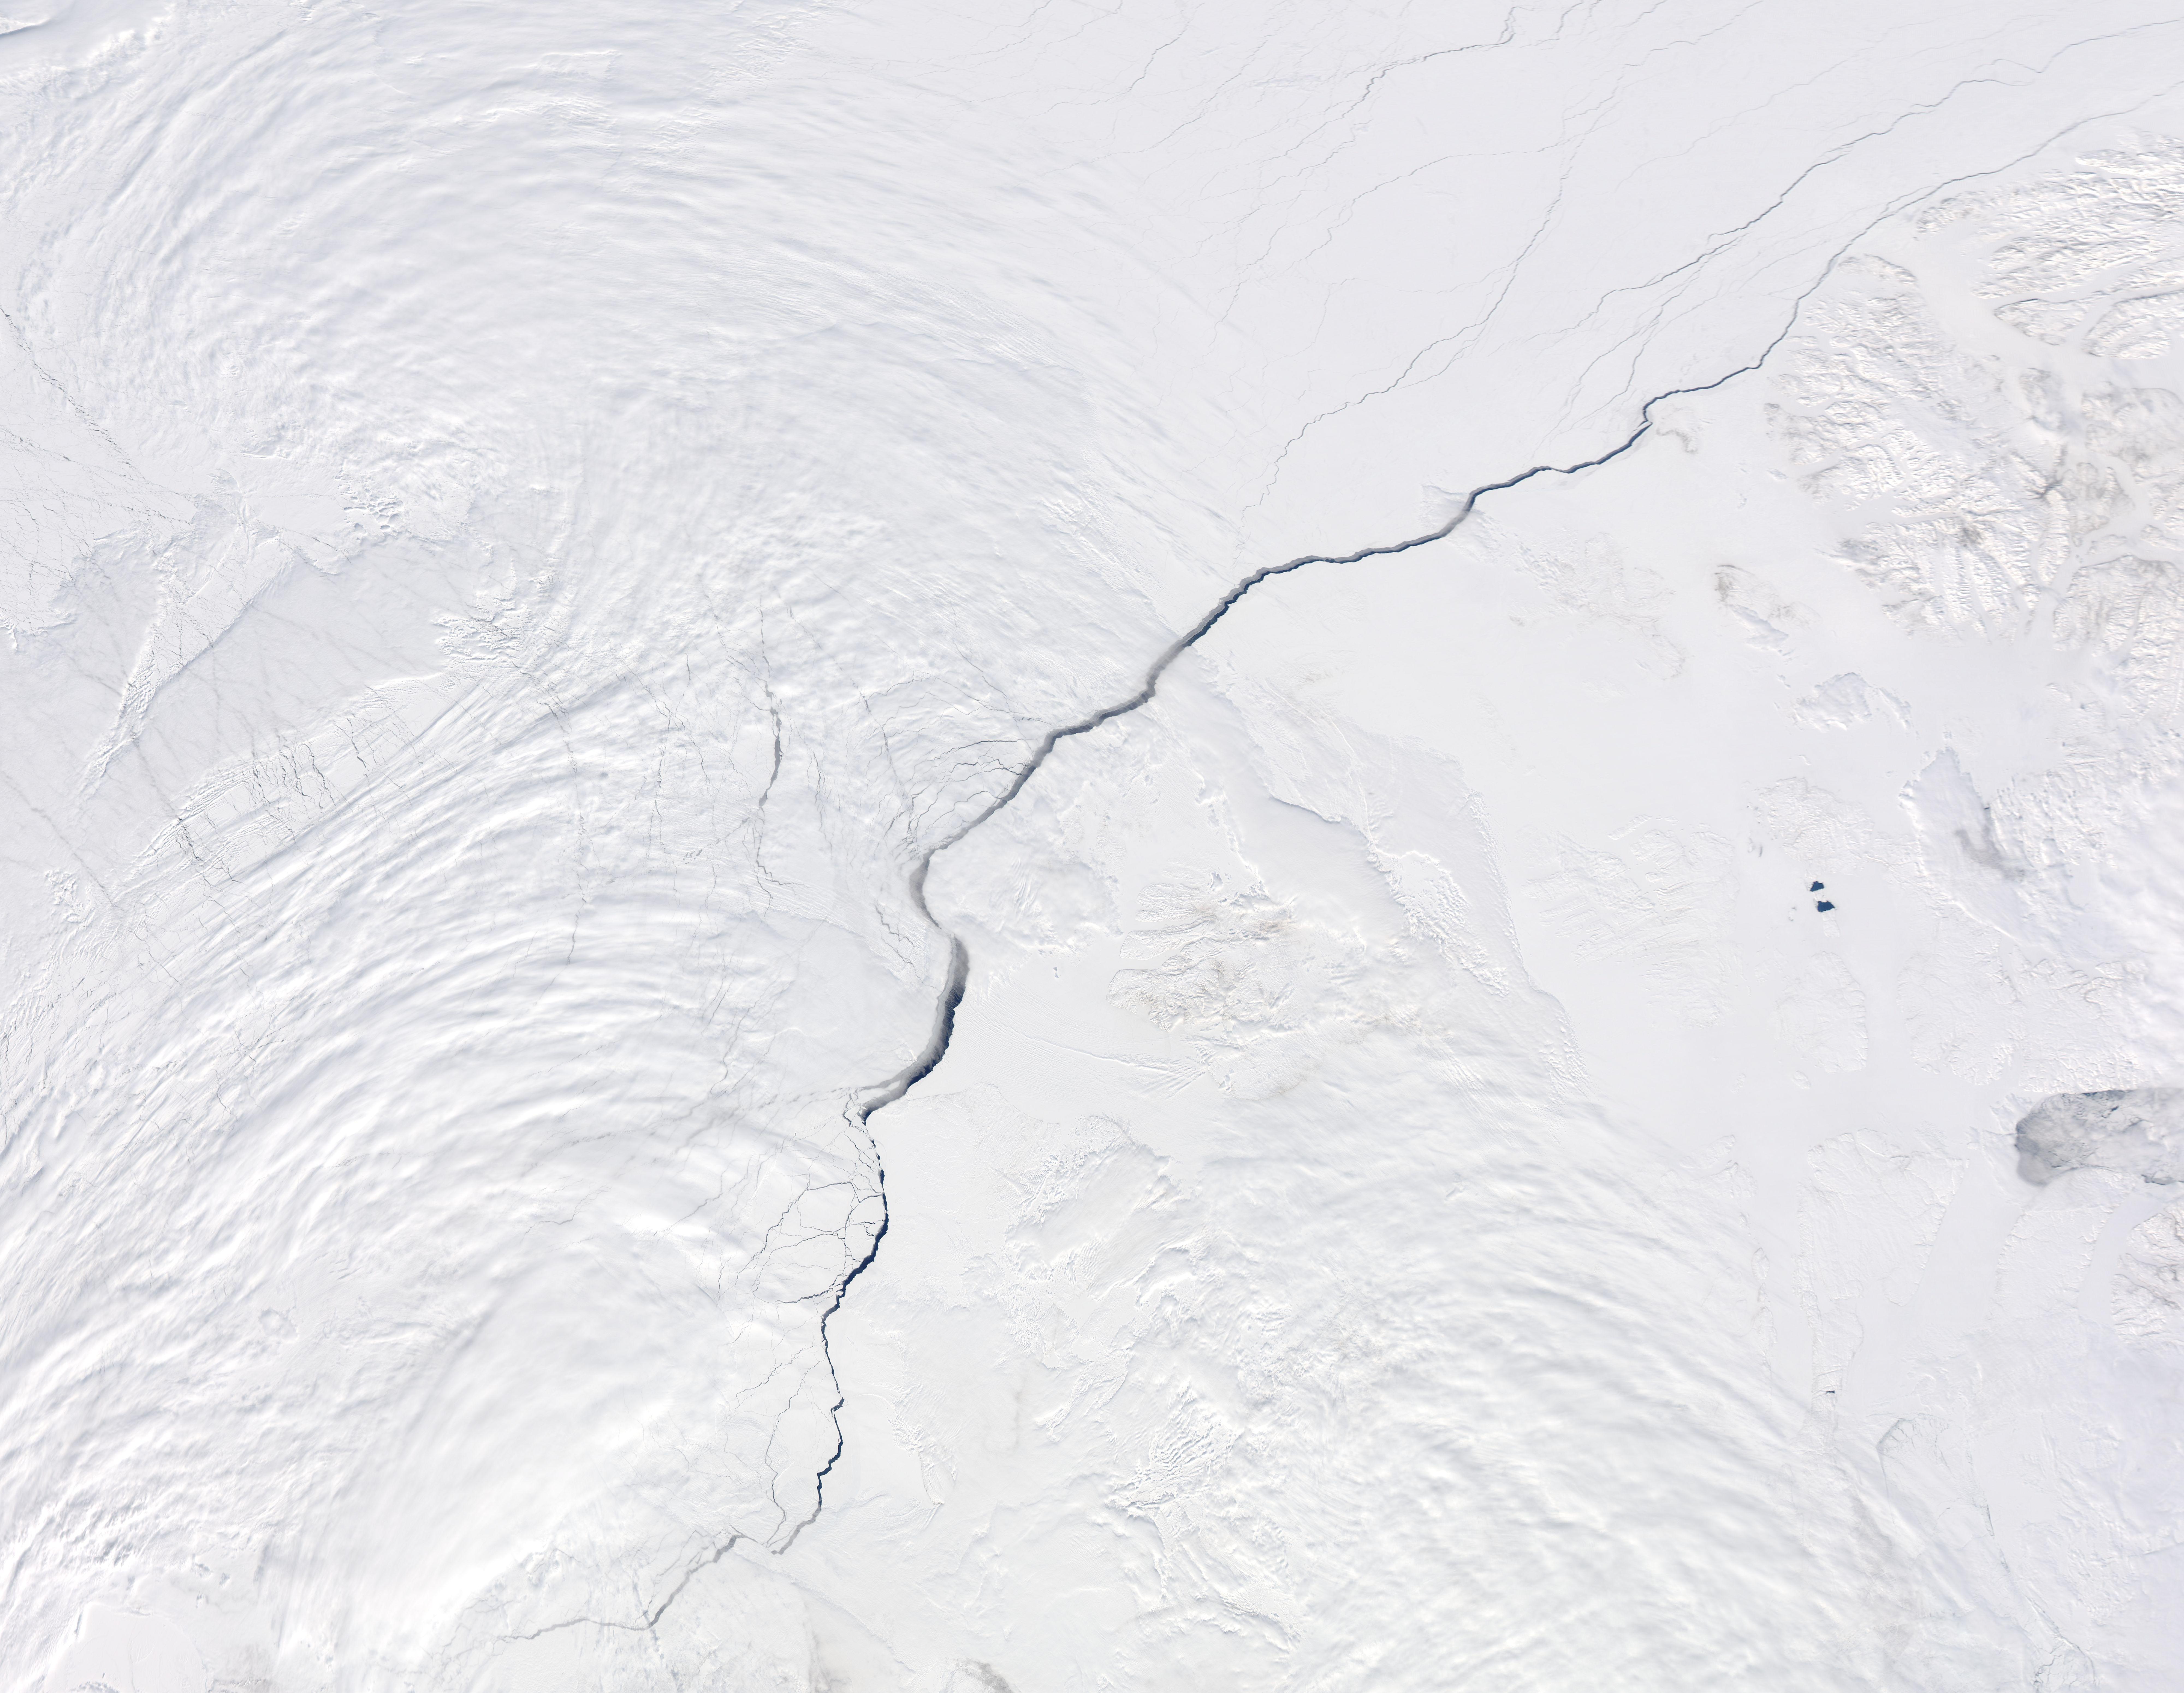 As Arctic warms, interest in geoengineering increases